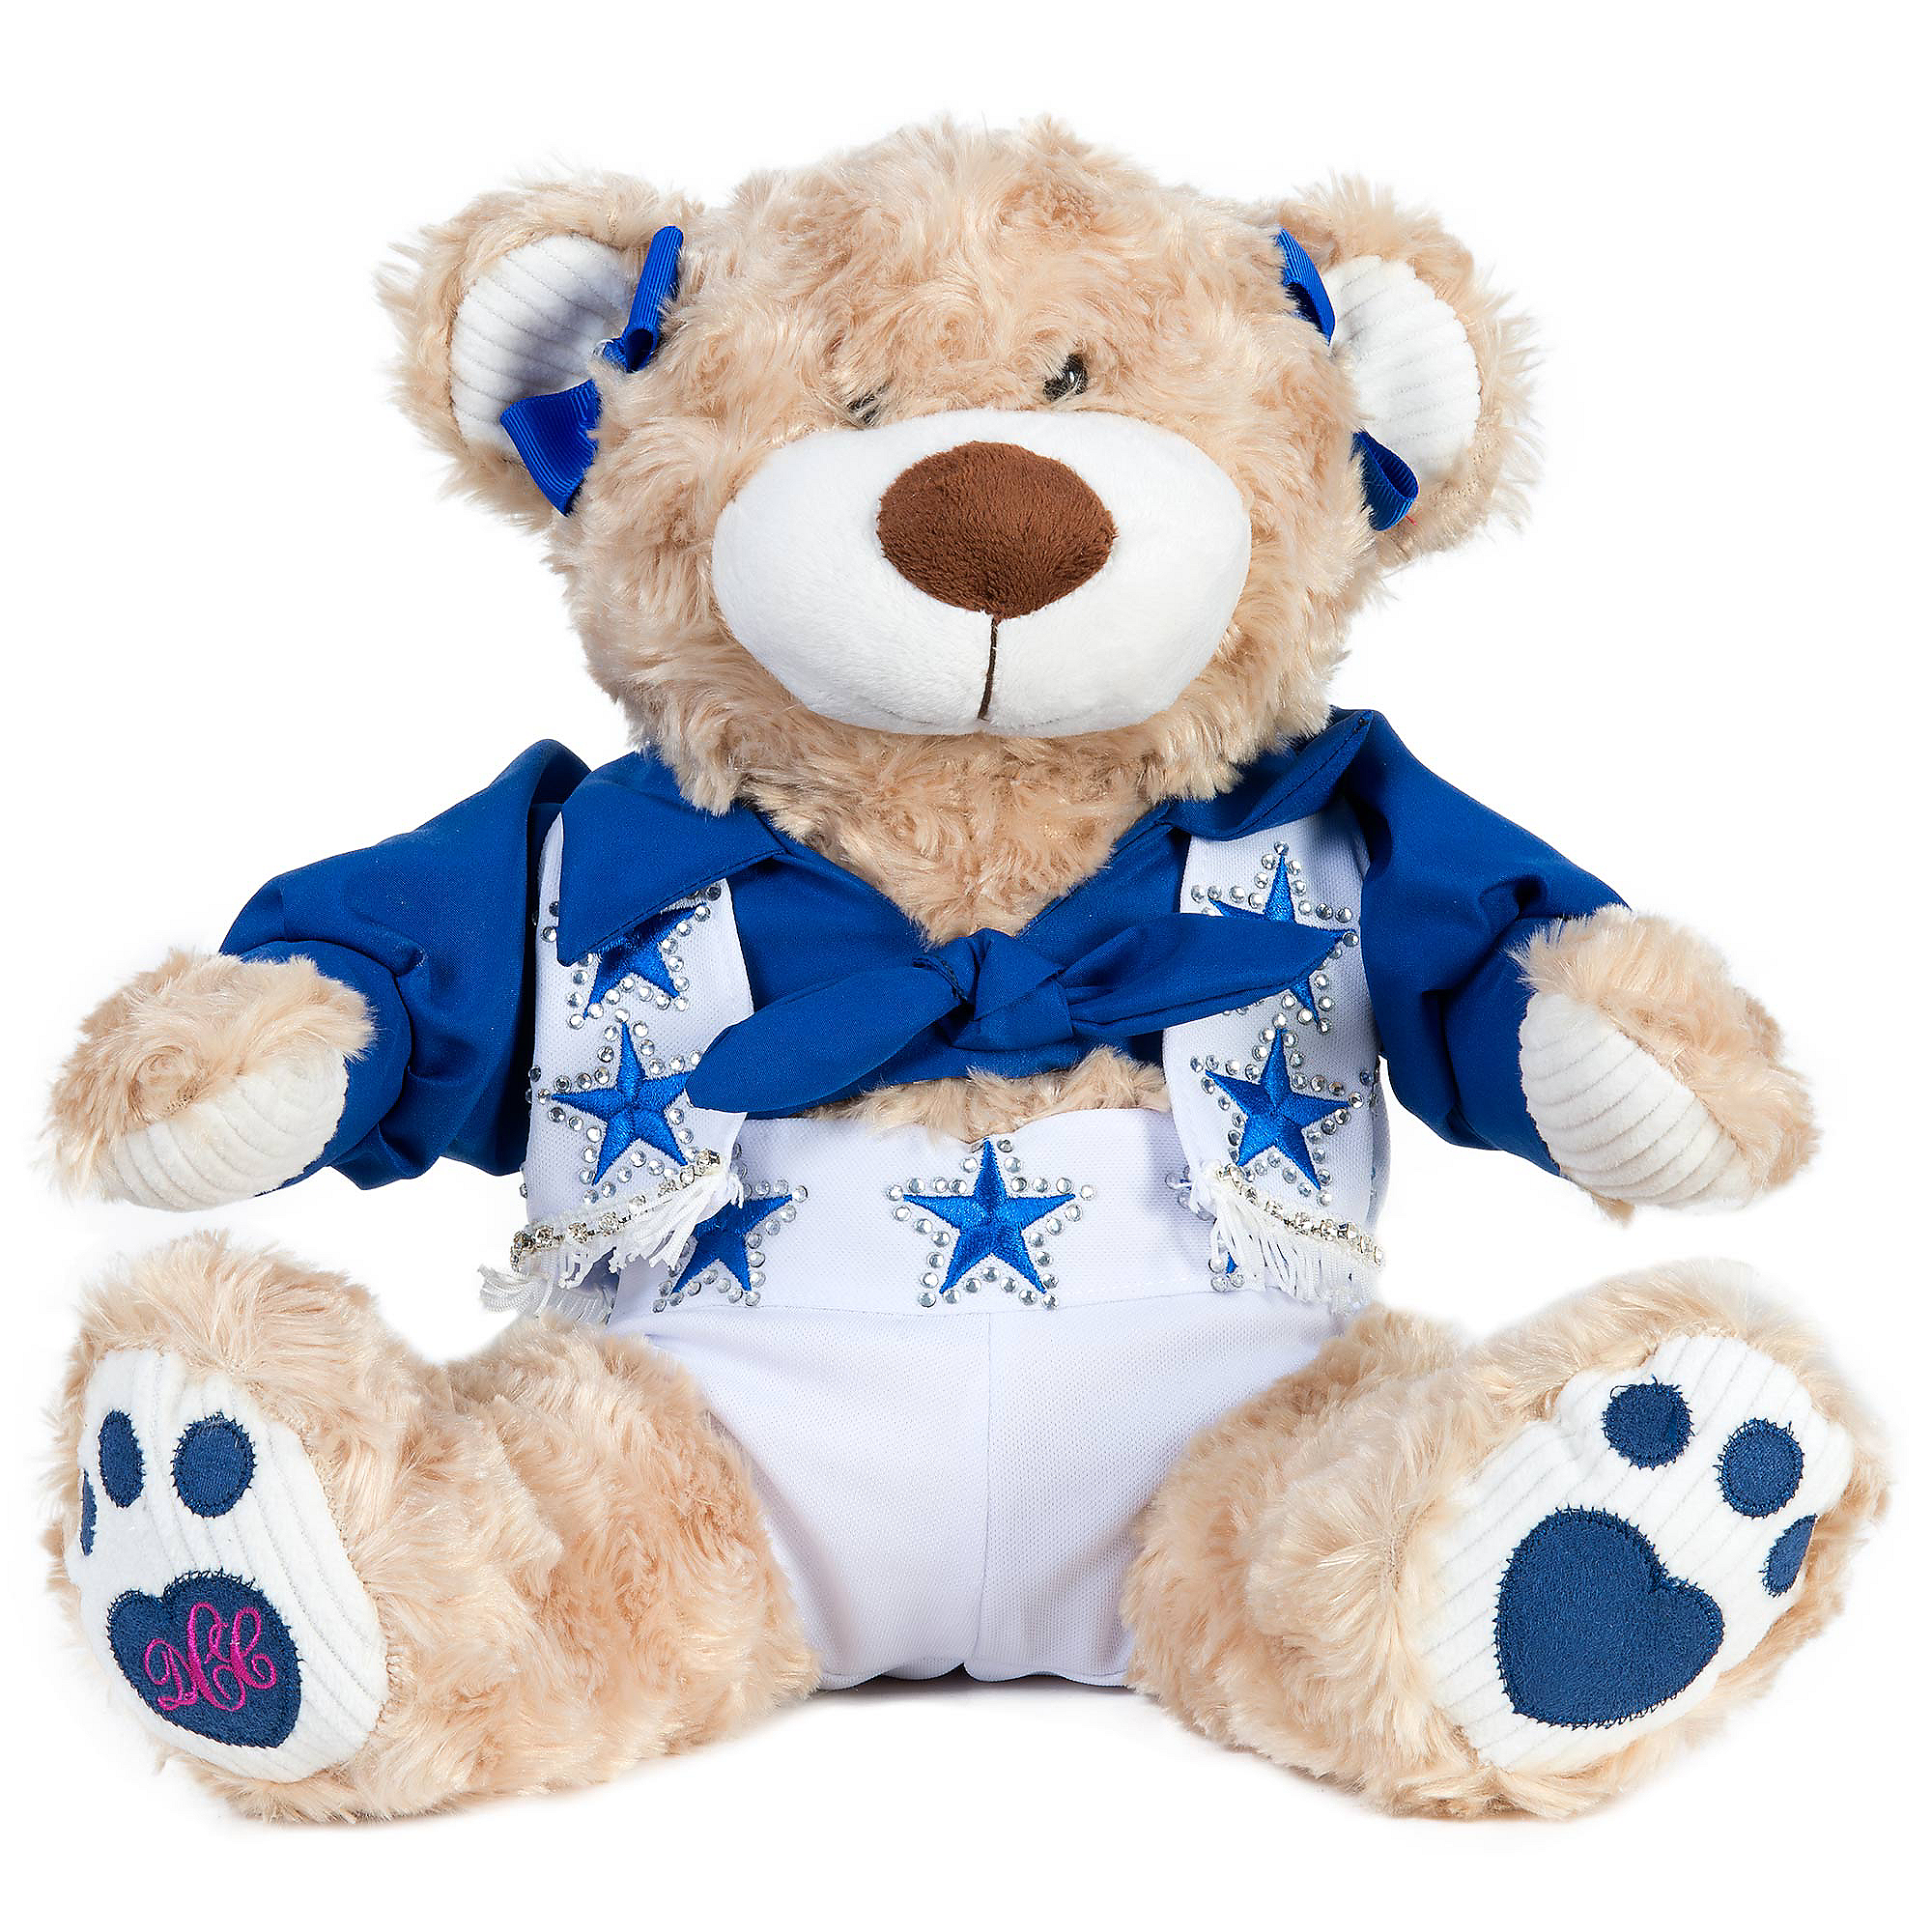 Dallas Cowboys Cheerleaders Abbey Bear